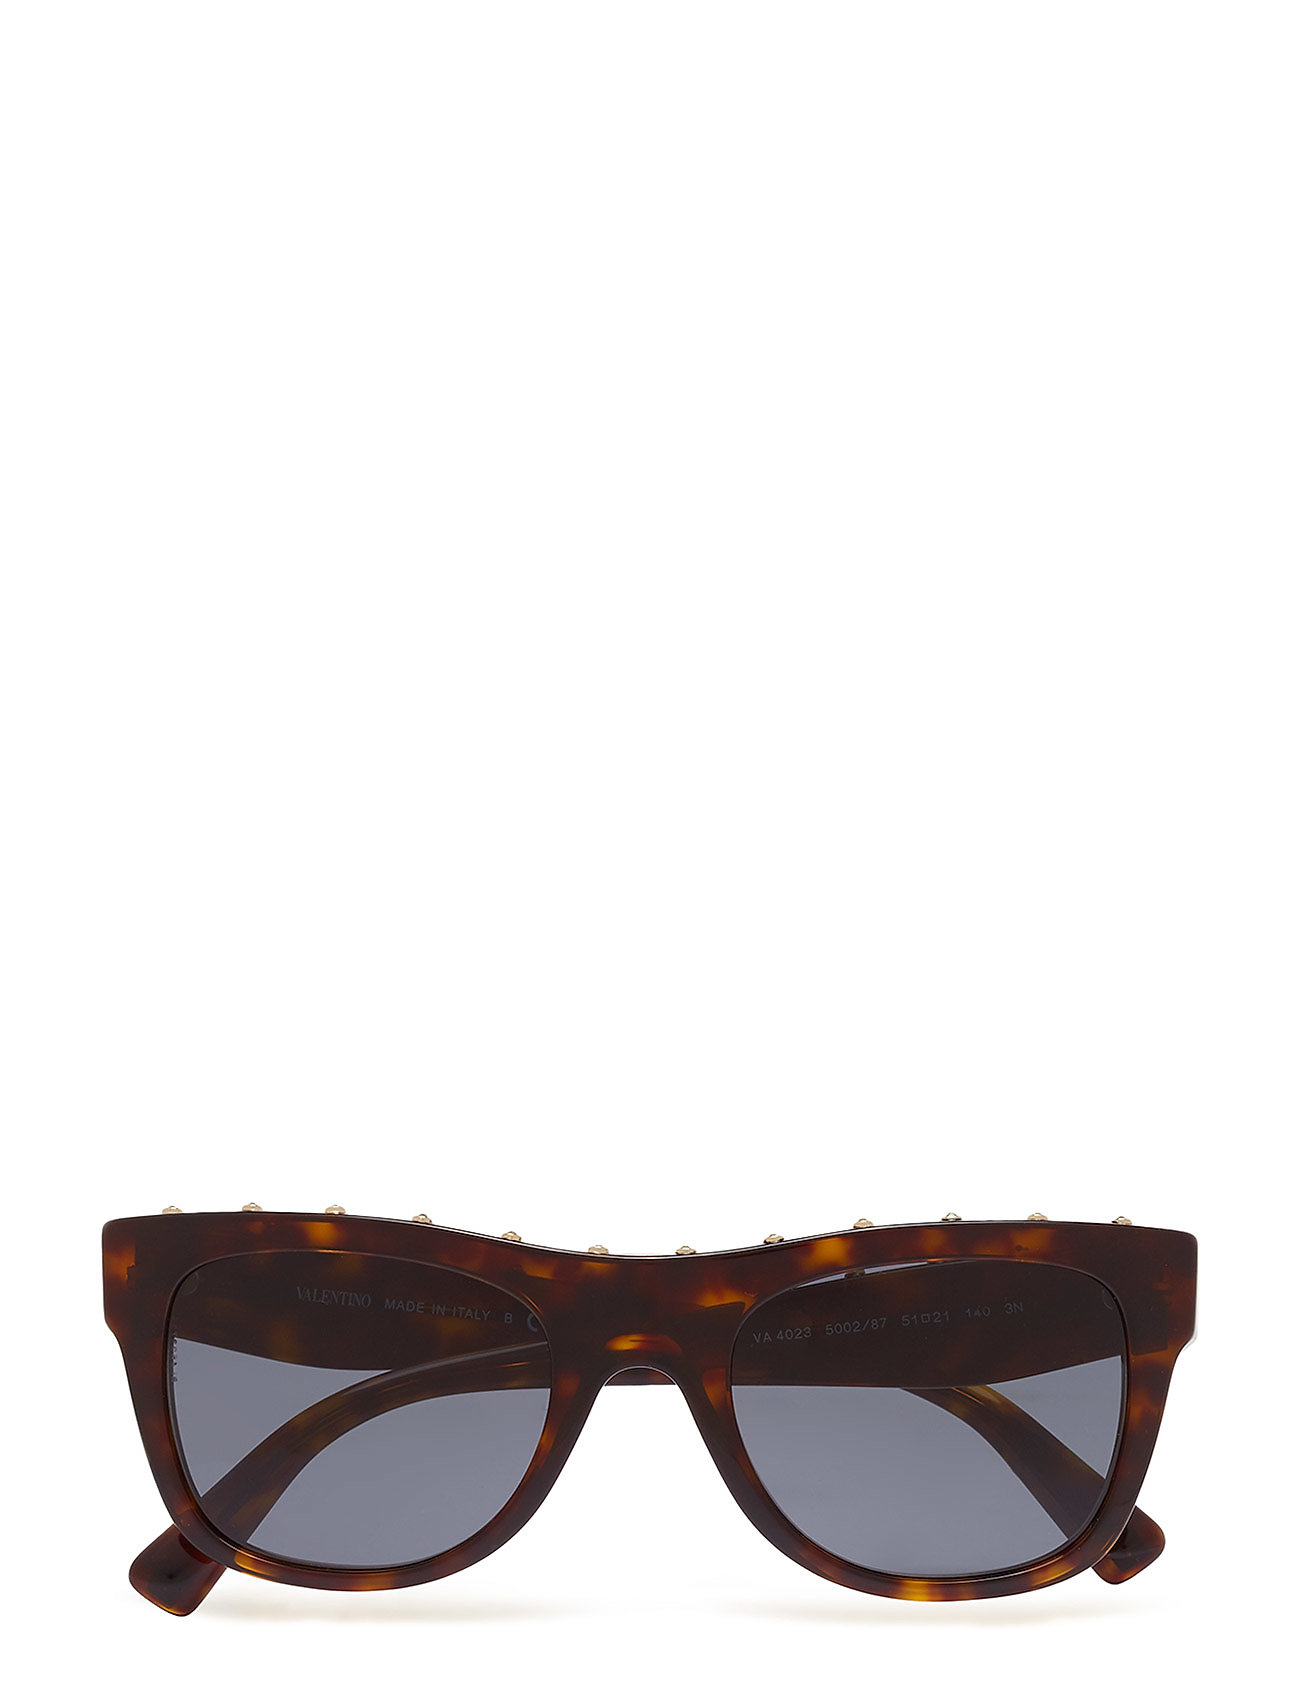 Soul Rockstud - Valentino Sunglasses